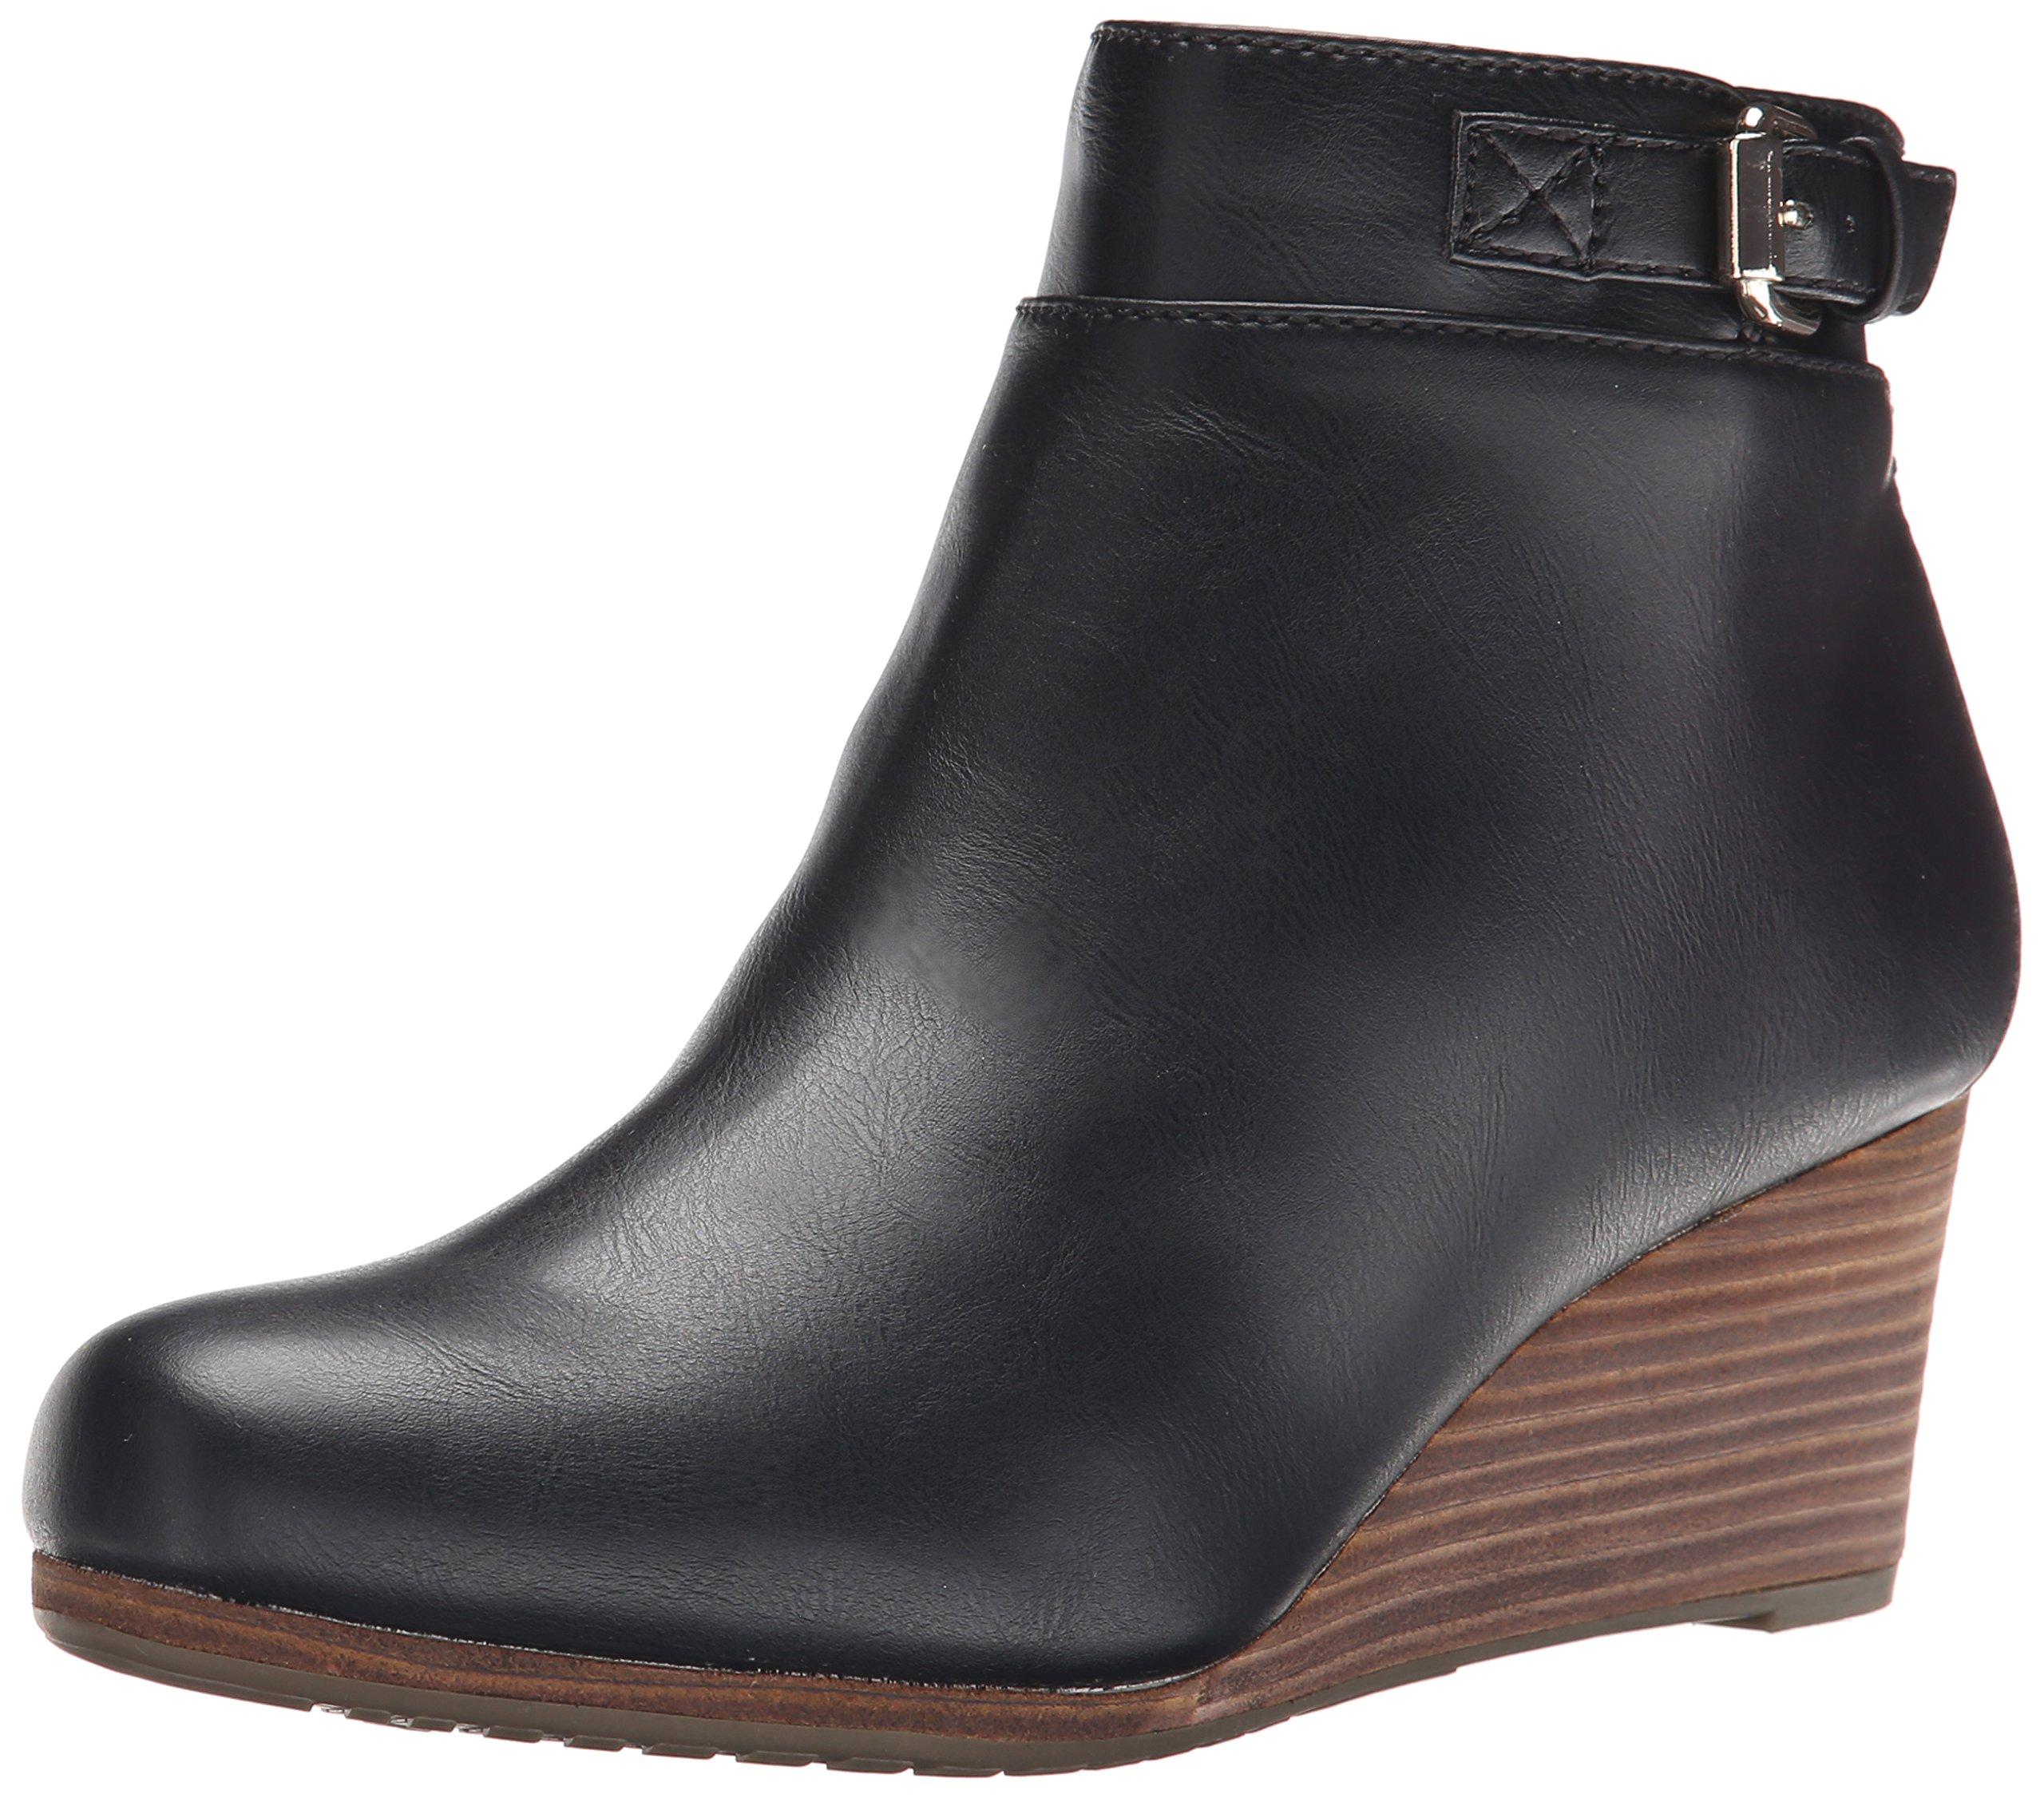 Dr. Scholl's Women's Daina Boot Daina,Black,10 M US